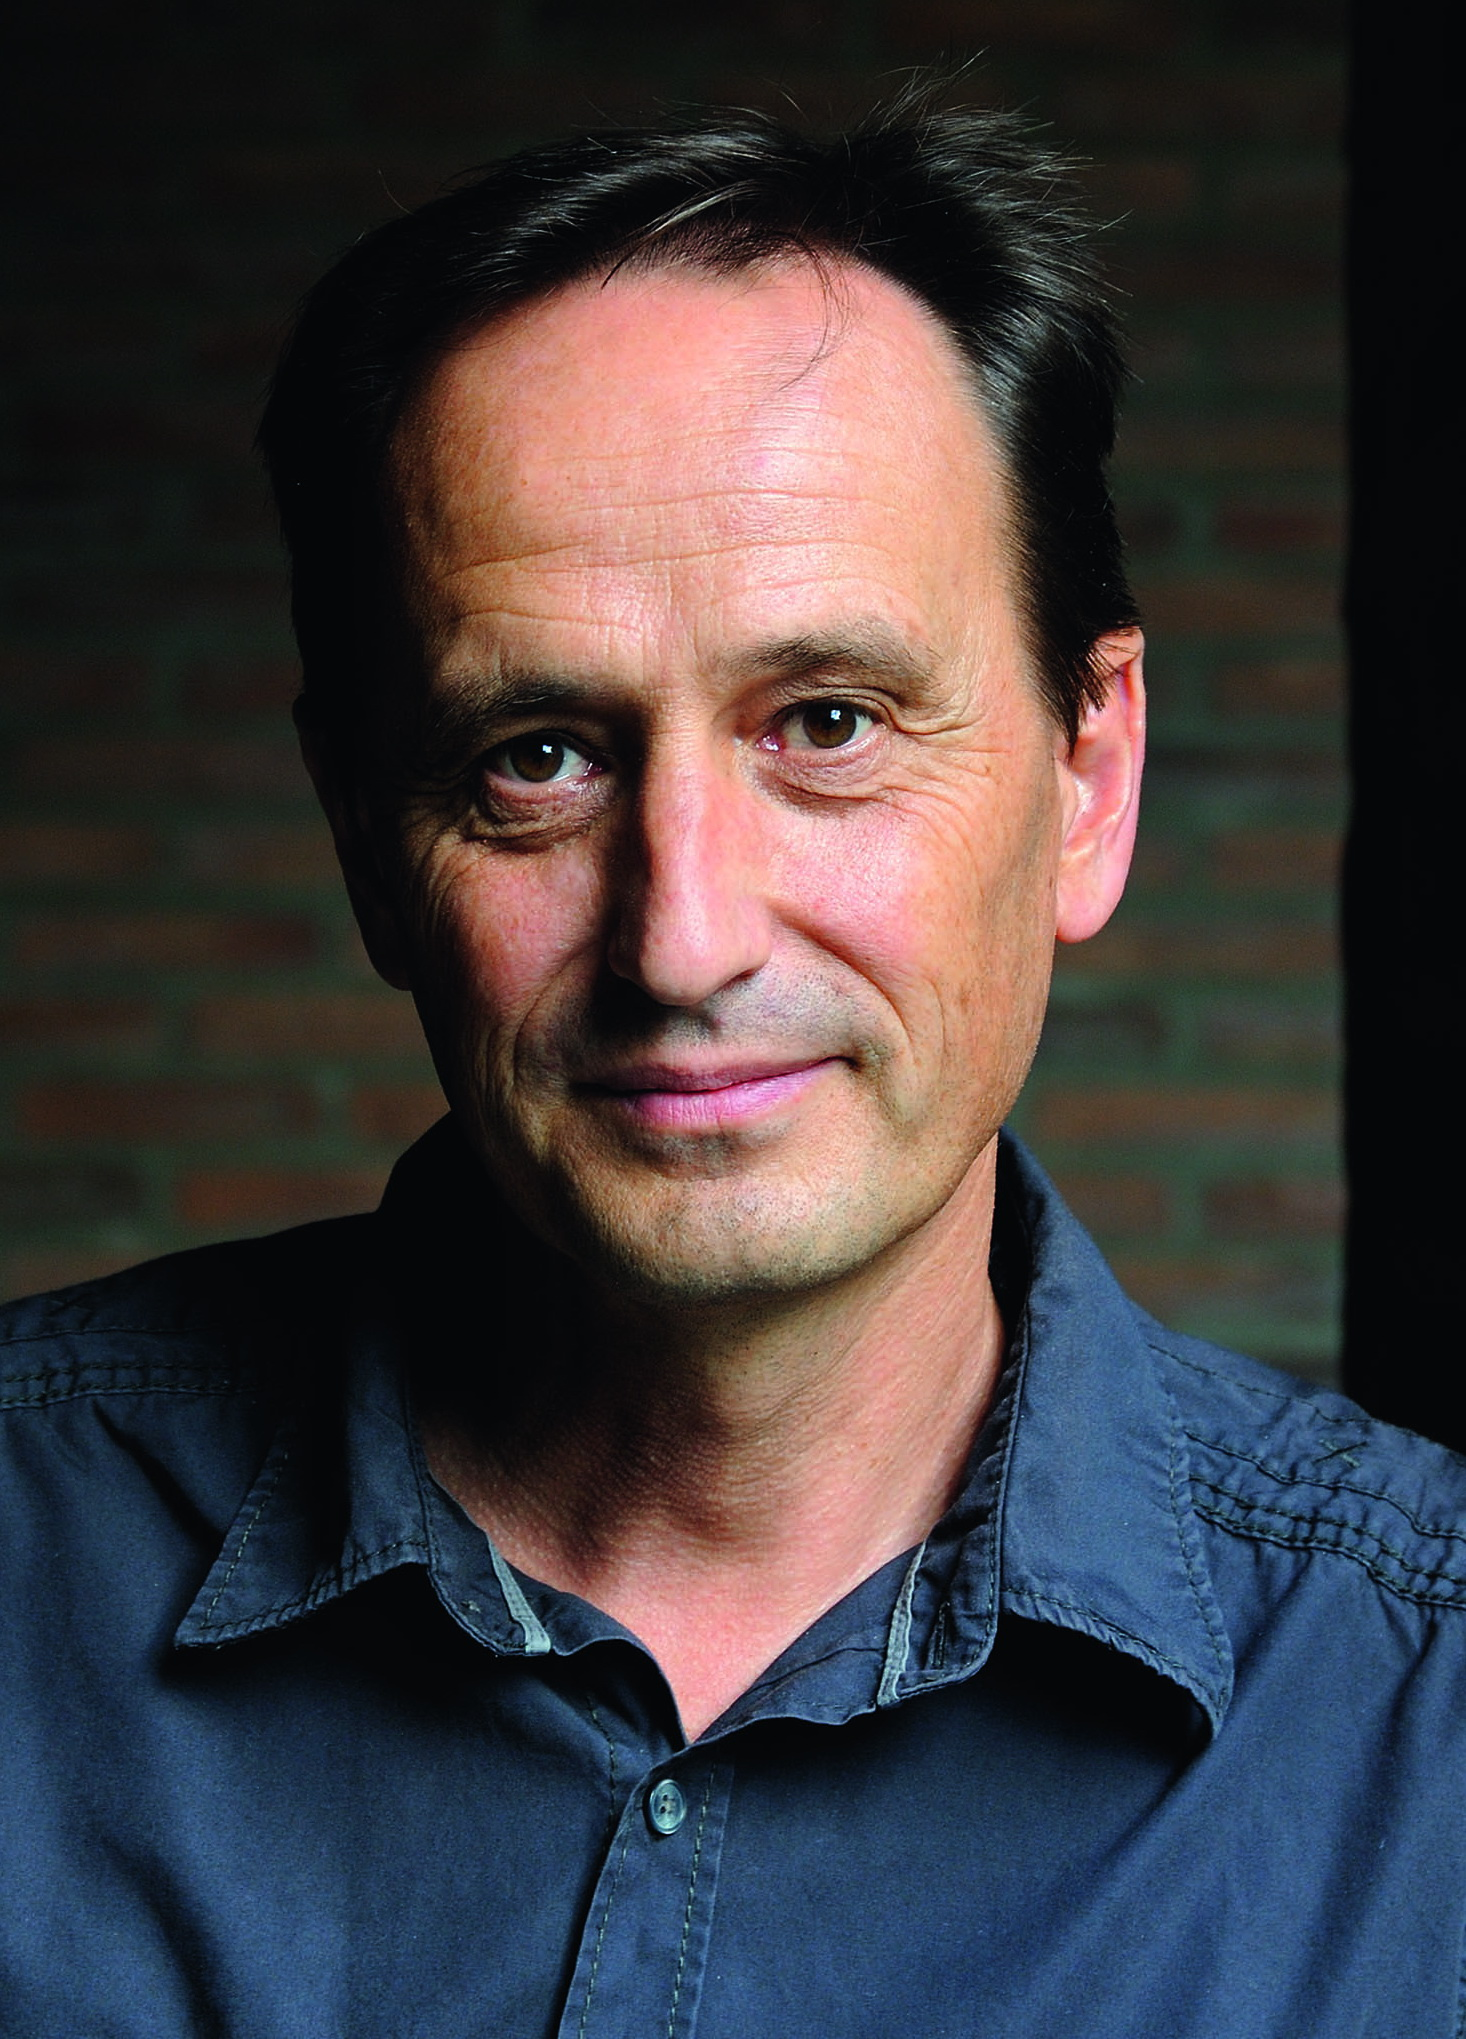 Schriftsteller Alois Prinz liest im Rahmen des Bildungskongresses